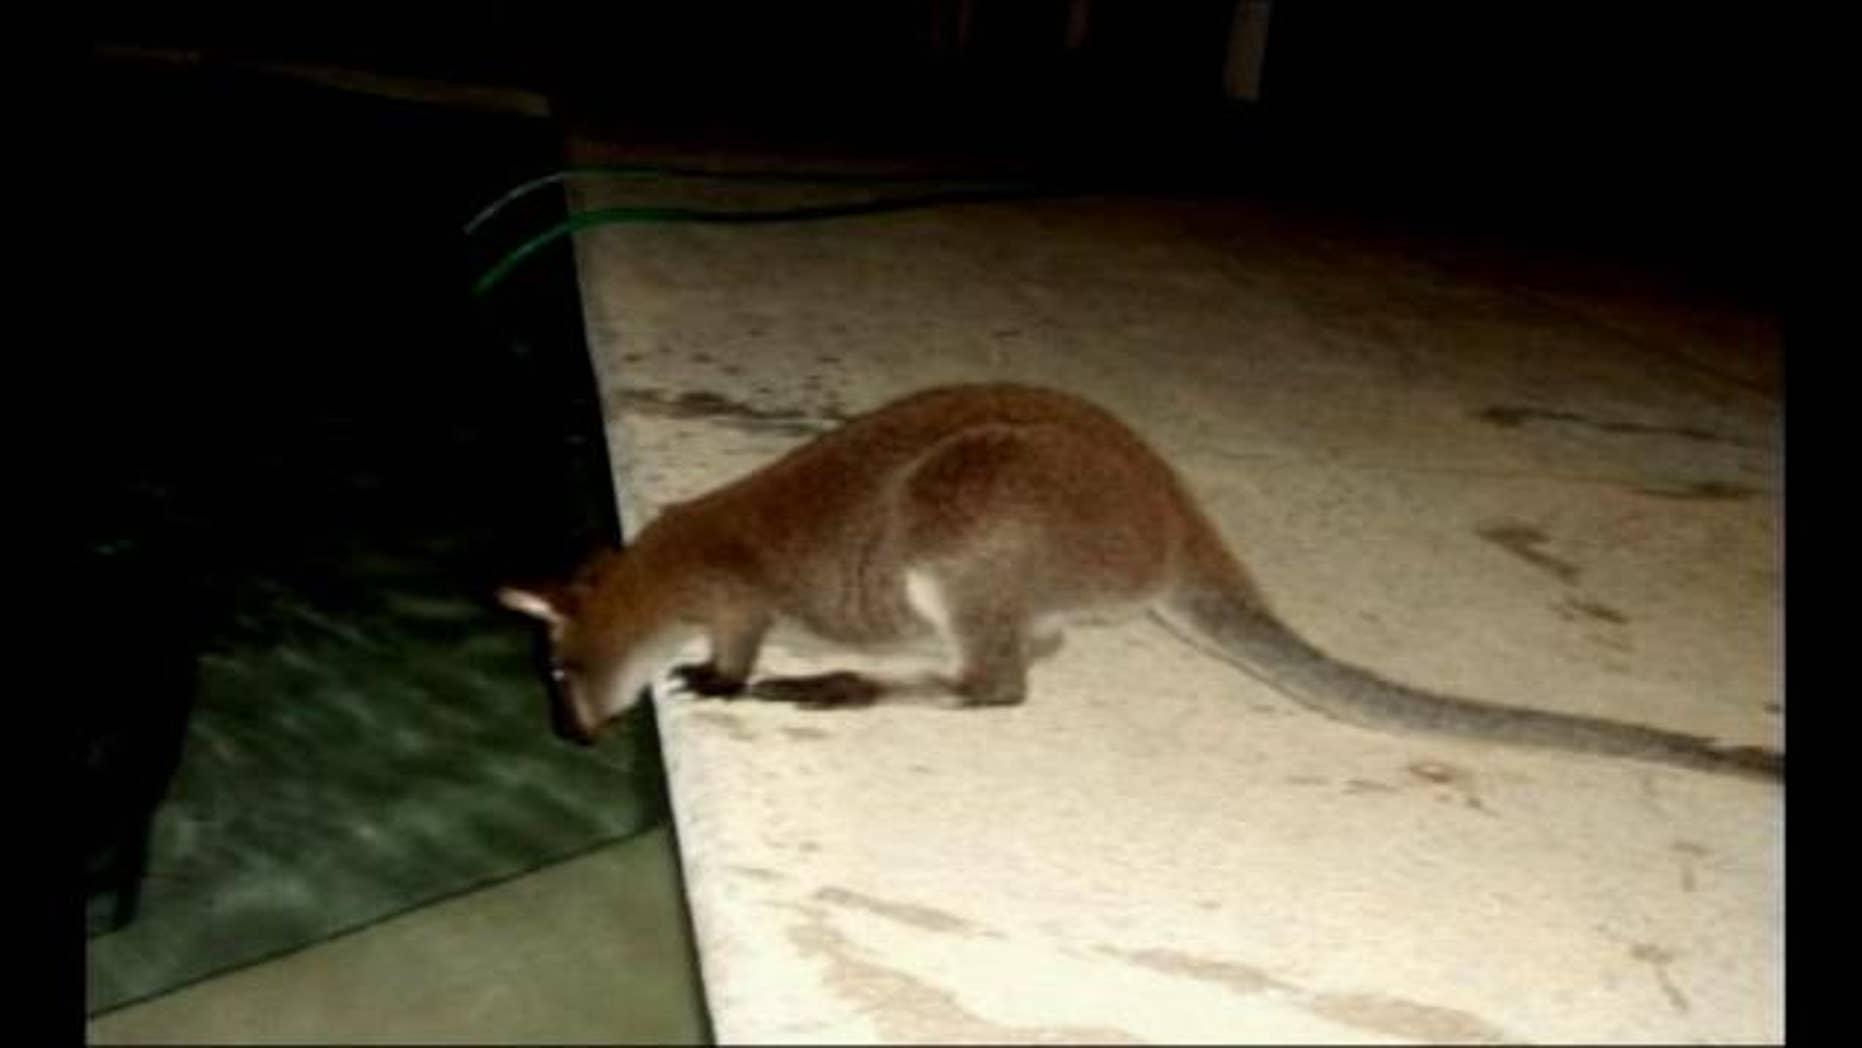 A freewheeling wallaby has been roaming through Windmere, reports ClickOrlando.com.